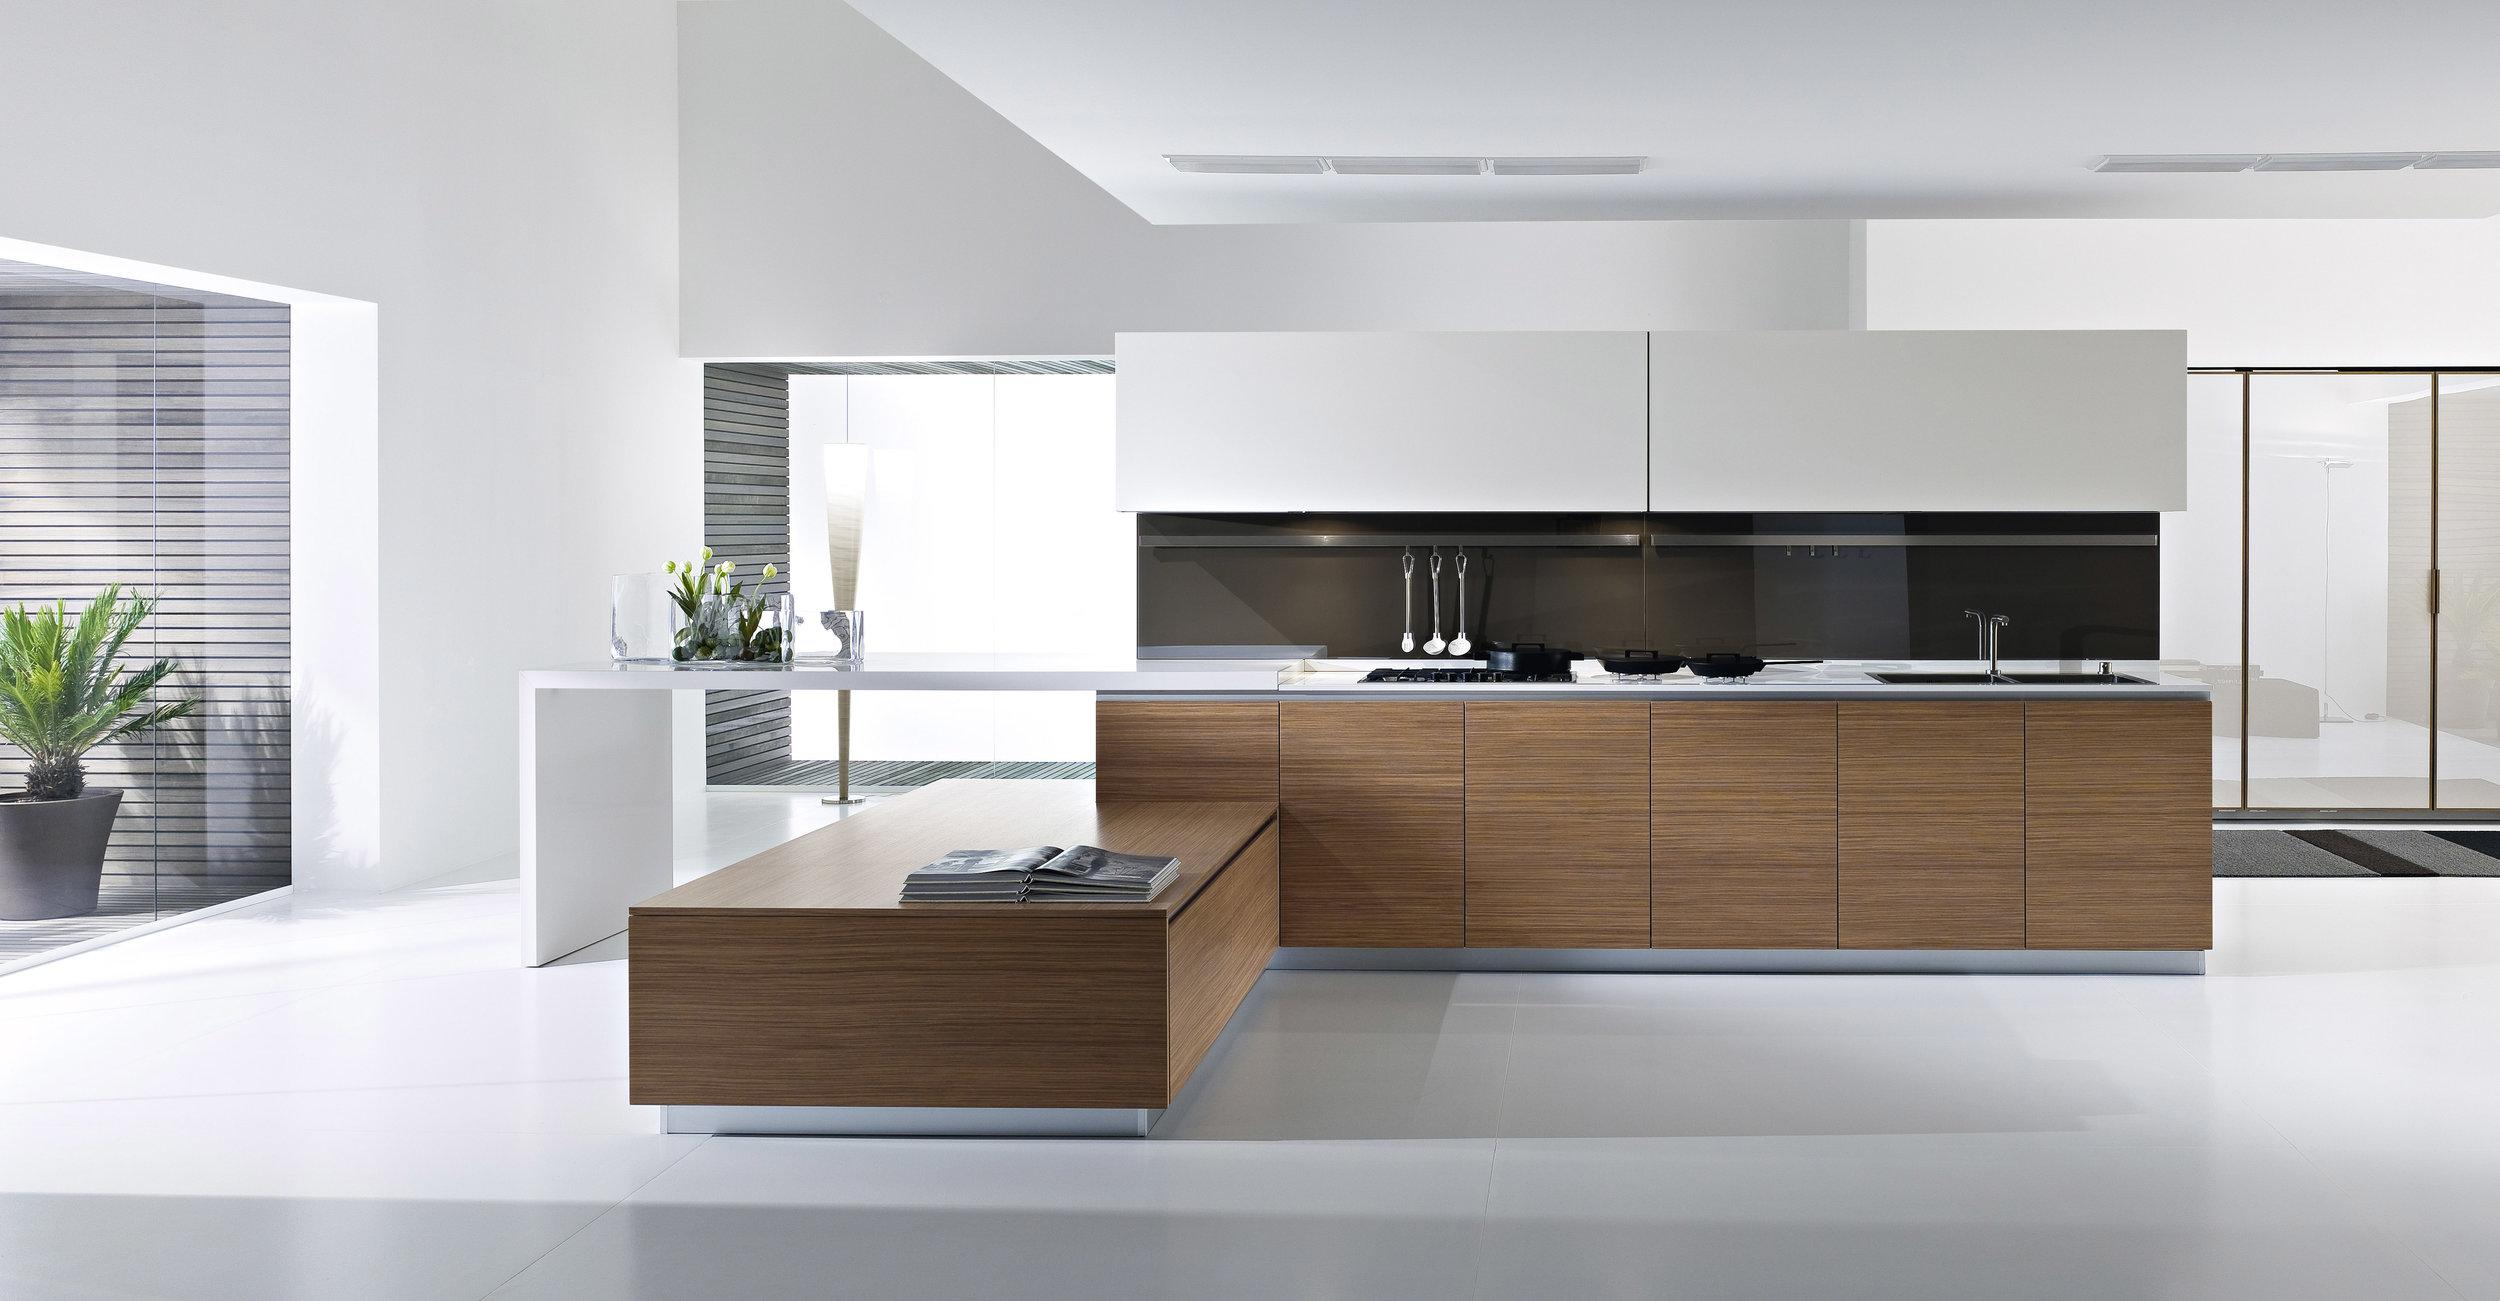 Luxury European Interiors. Bathroom Kitchen Showroom And Design ...